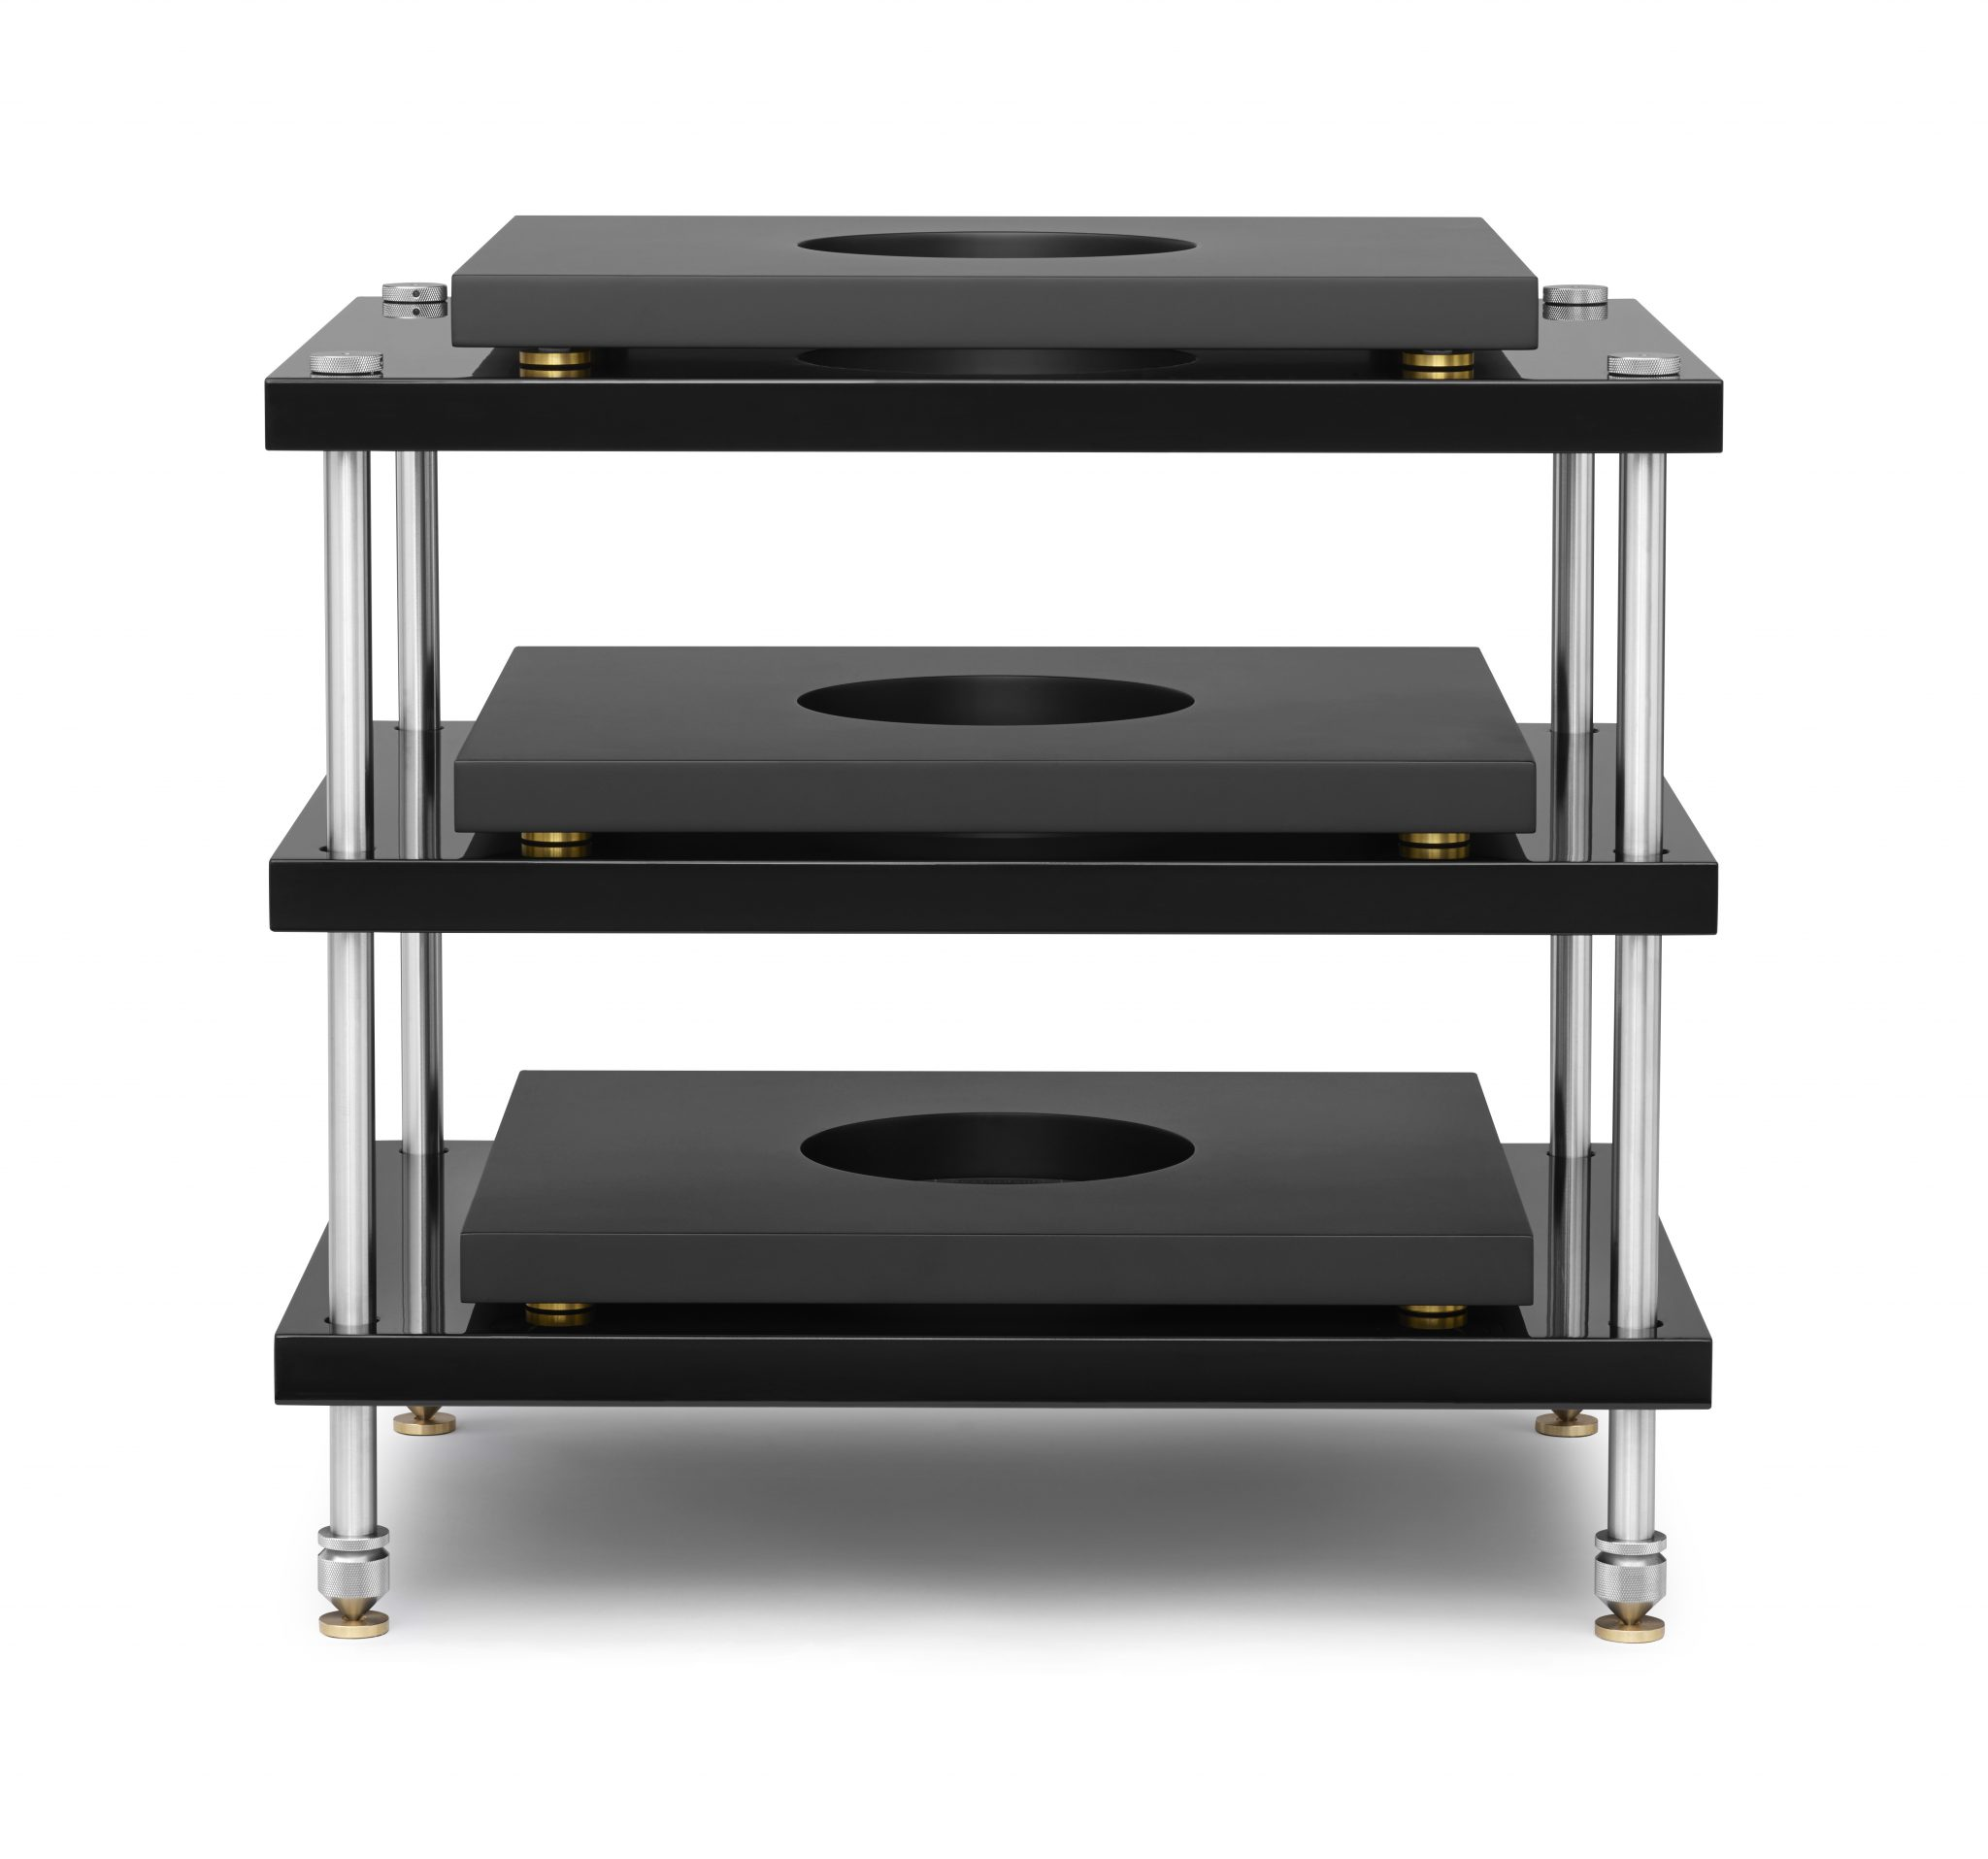 racks productions rear hd production rack equipment ppu unit portable audio qed